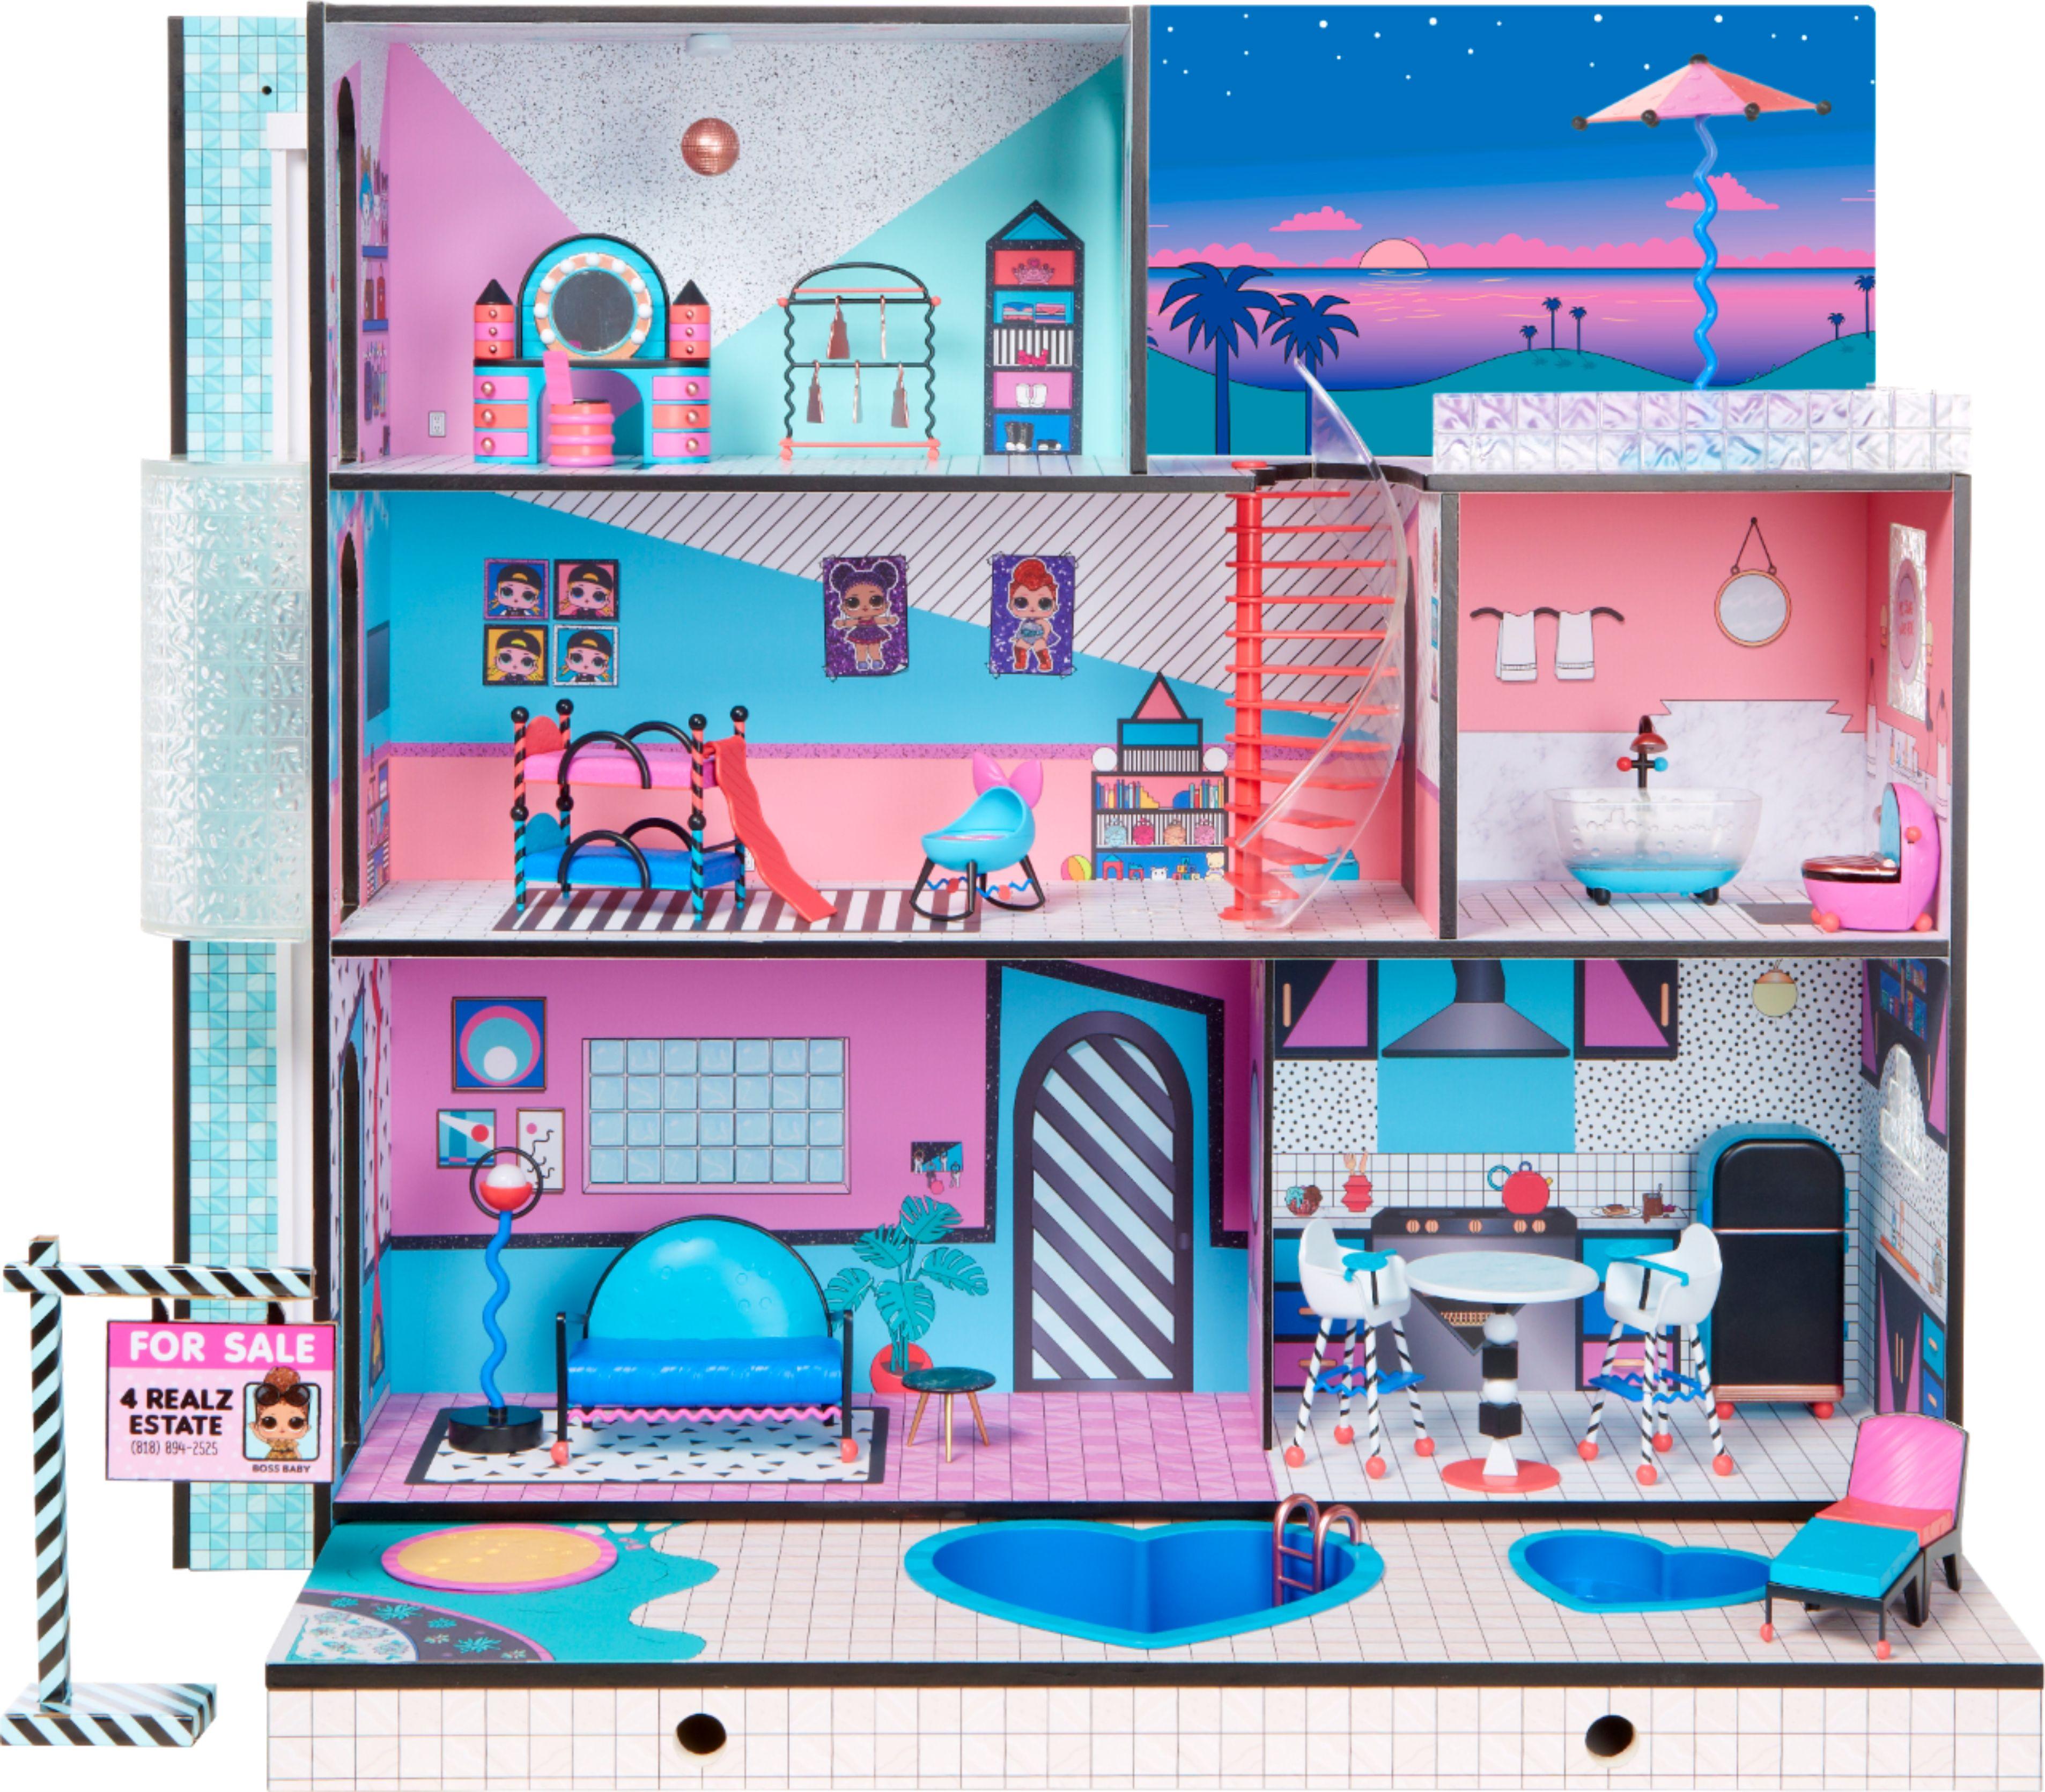 LOL Surprise Doll house $129.99